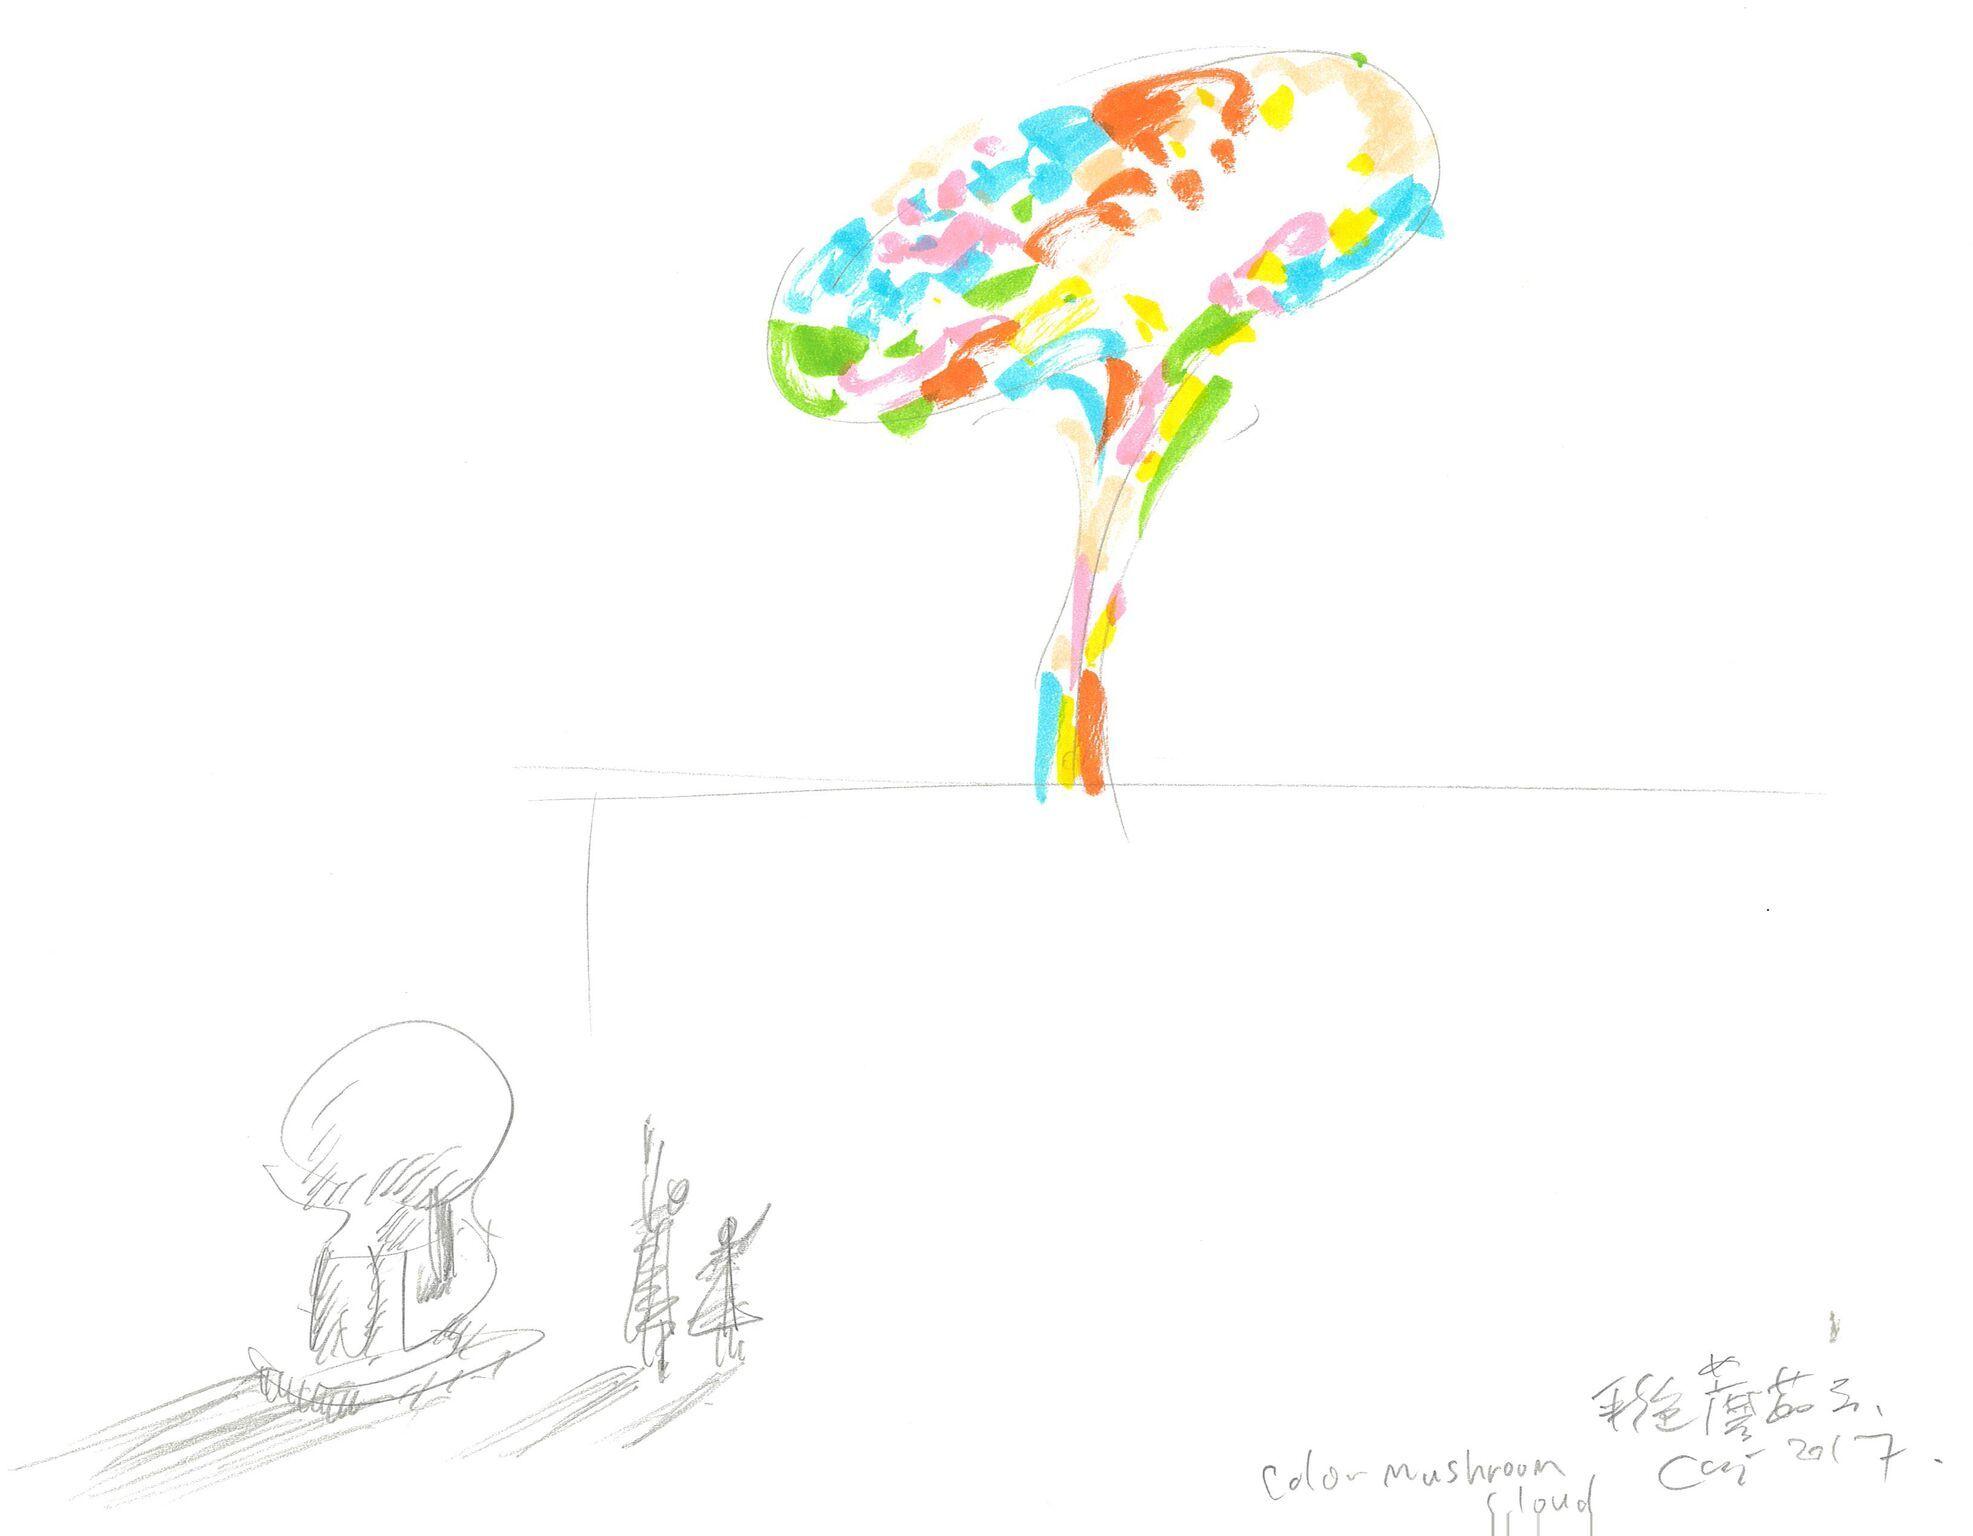 12_01_Cai_Mushroom